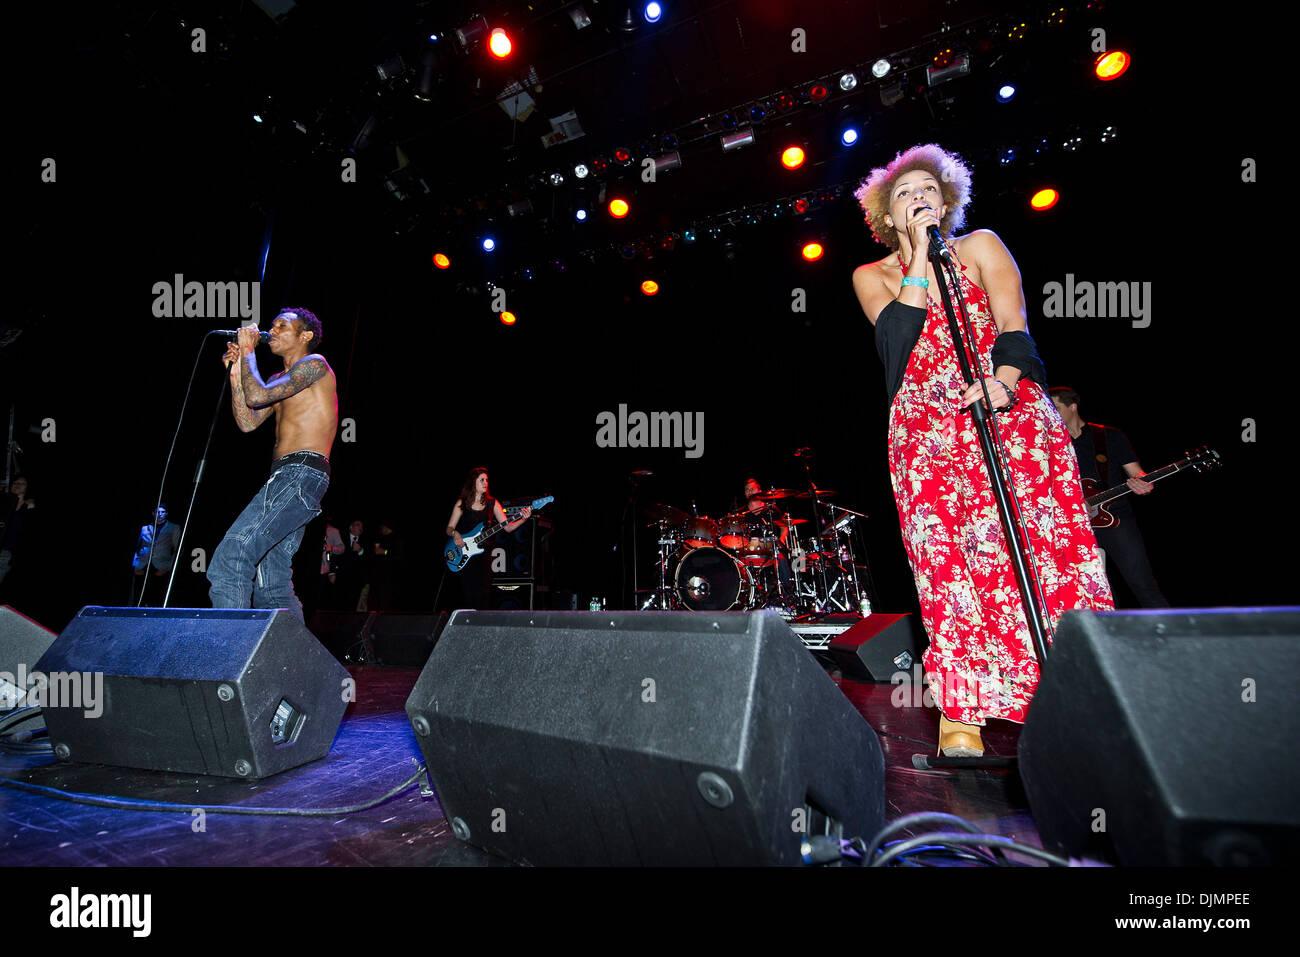 Tricky and Martina Topley Bird perform at the Indigo London, UK - 27.04.12 - Stock Image